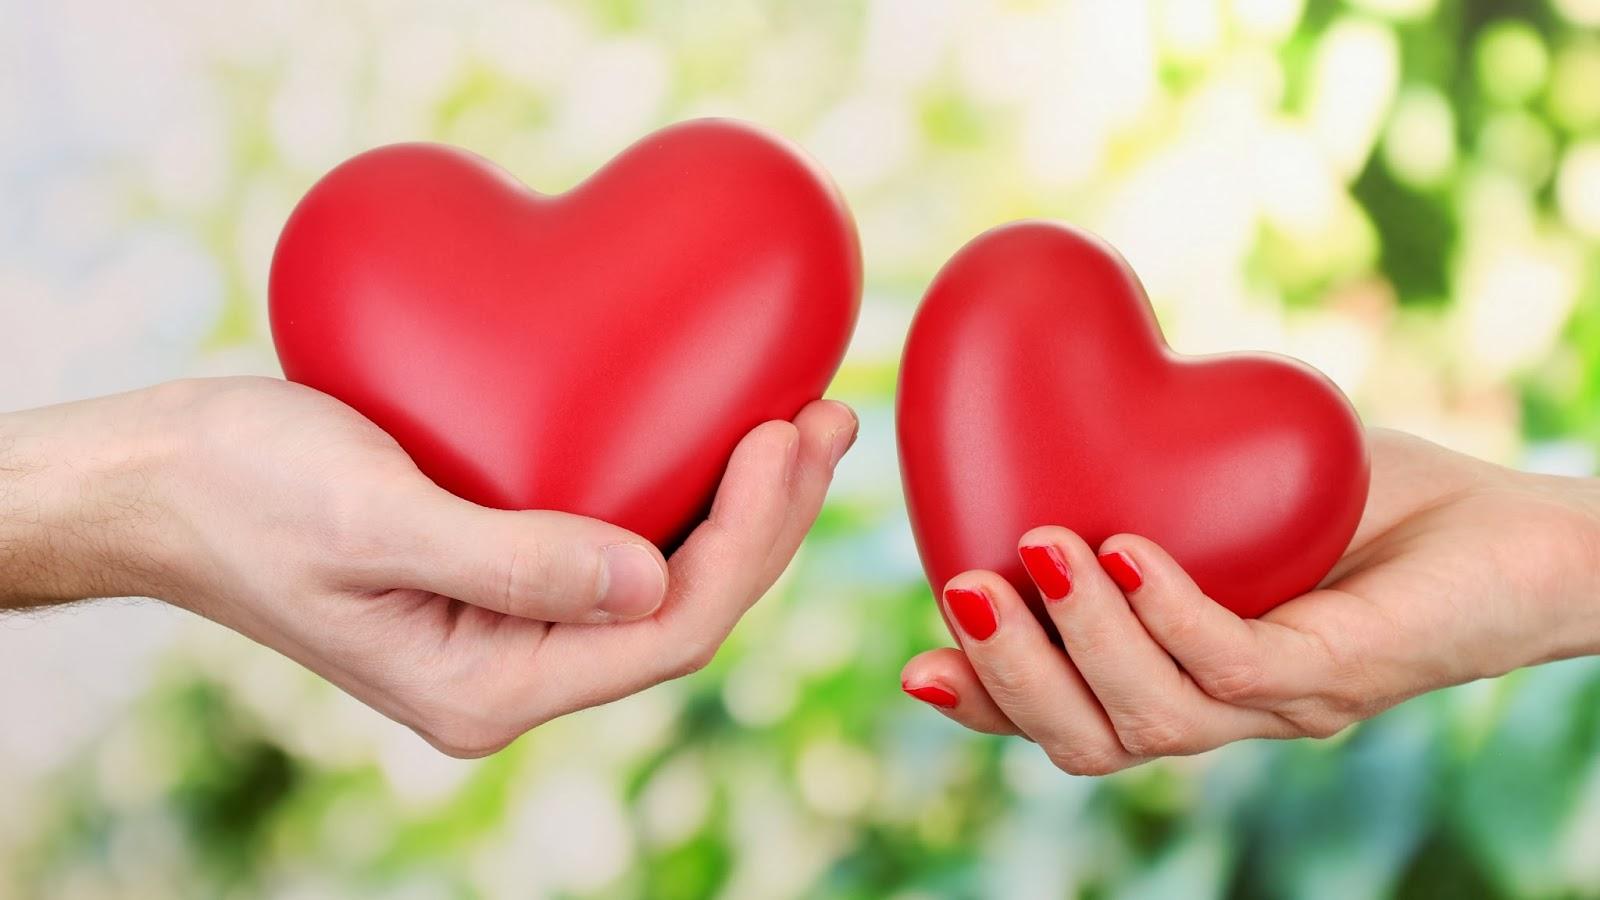 بالصور صور قلب حب , اجمل صور قلوب 3317 9